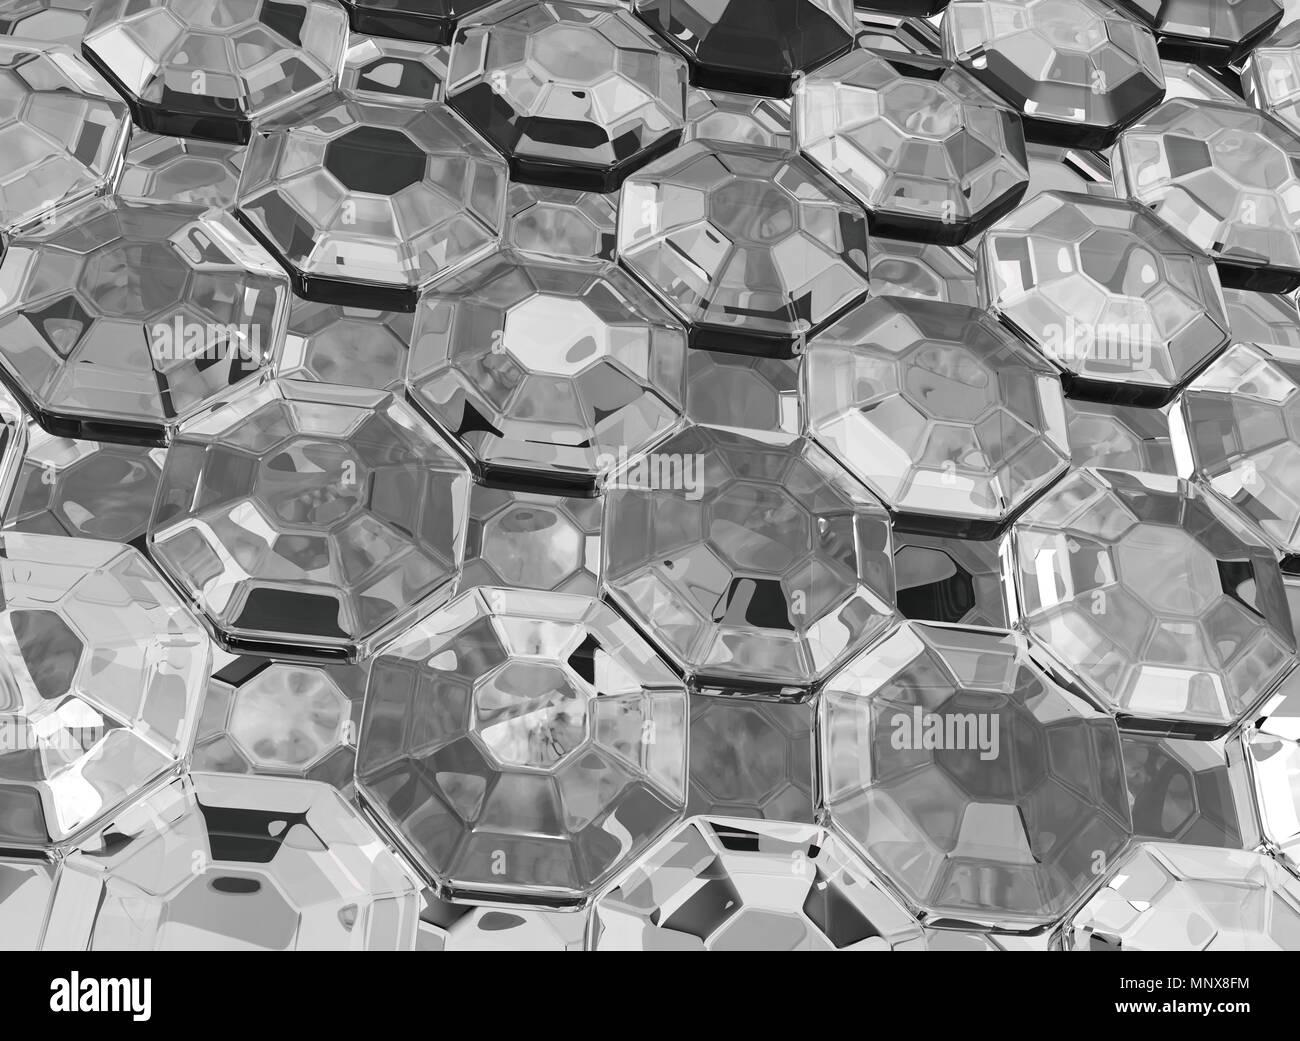 Glass Diamond Artificial Jewel Surface Close 3d Illustration Horizontal Texture Wallpaper Background